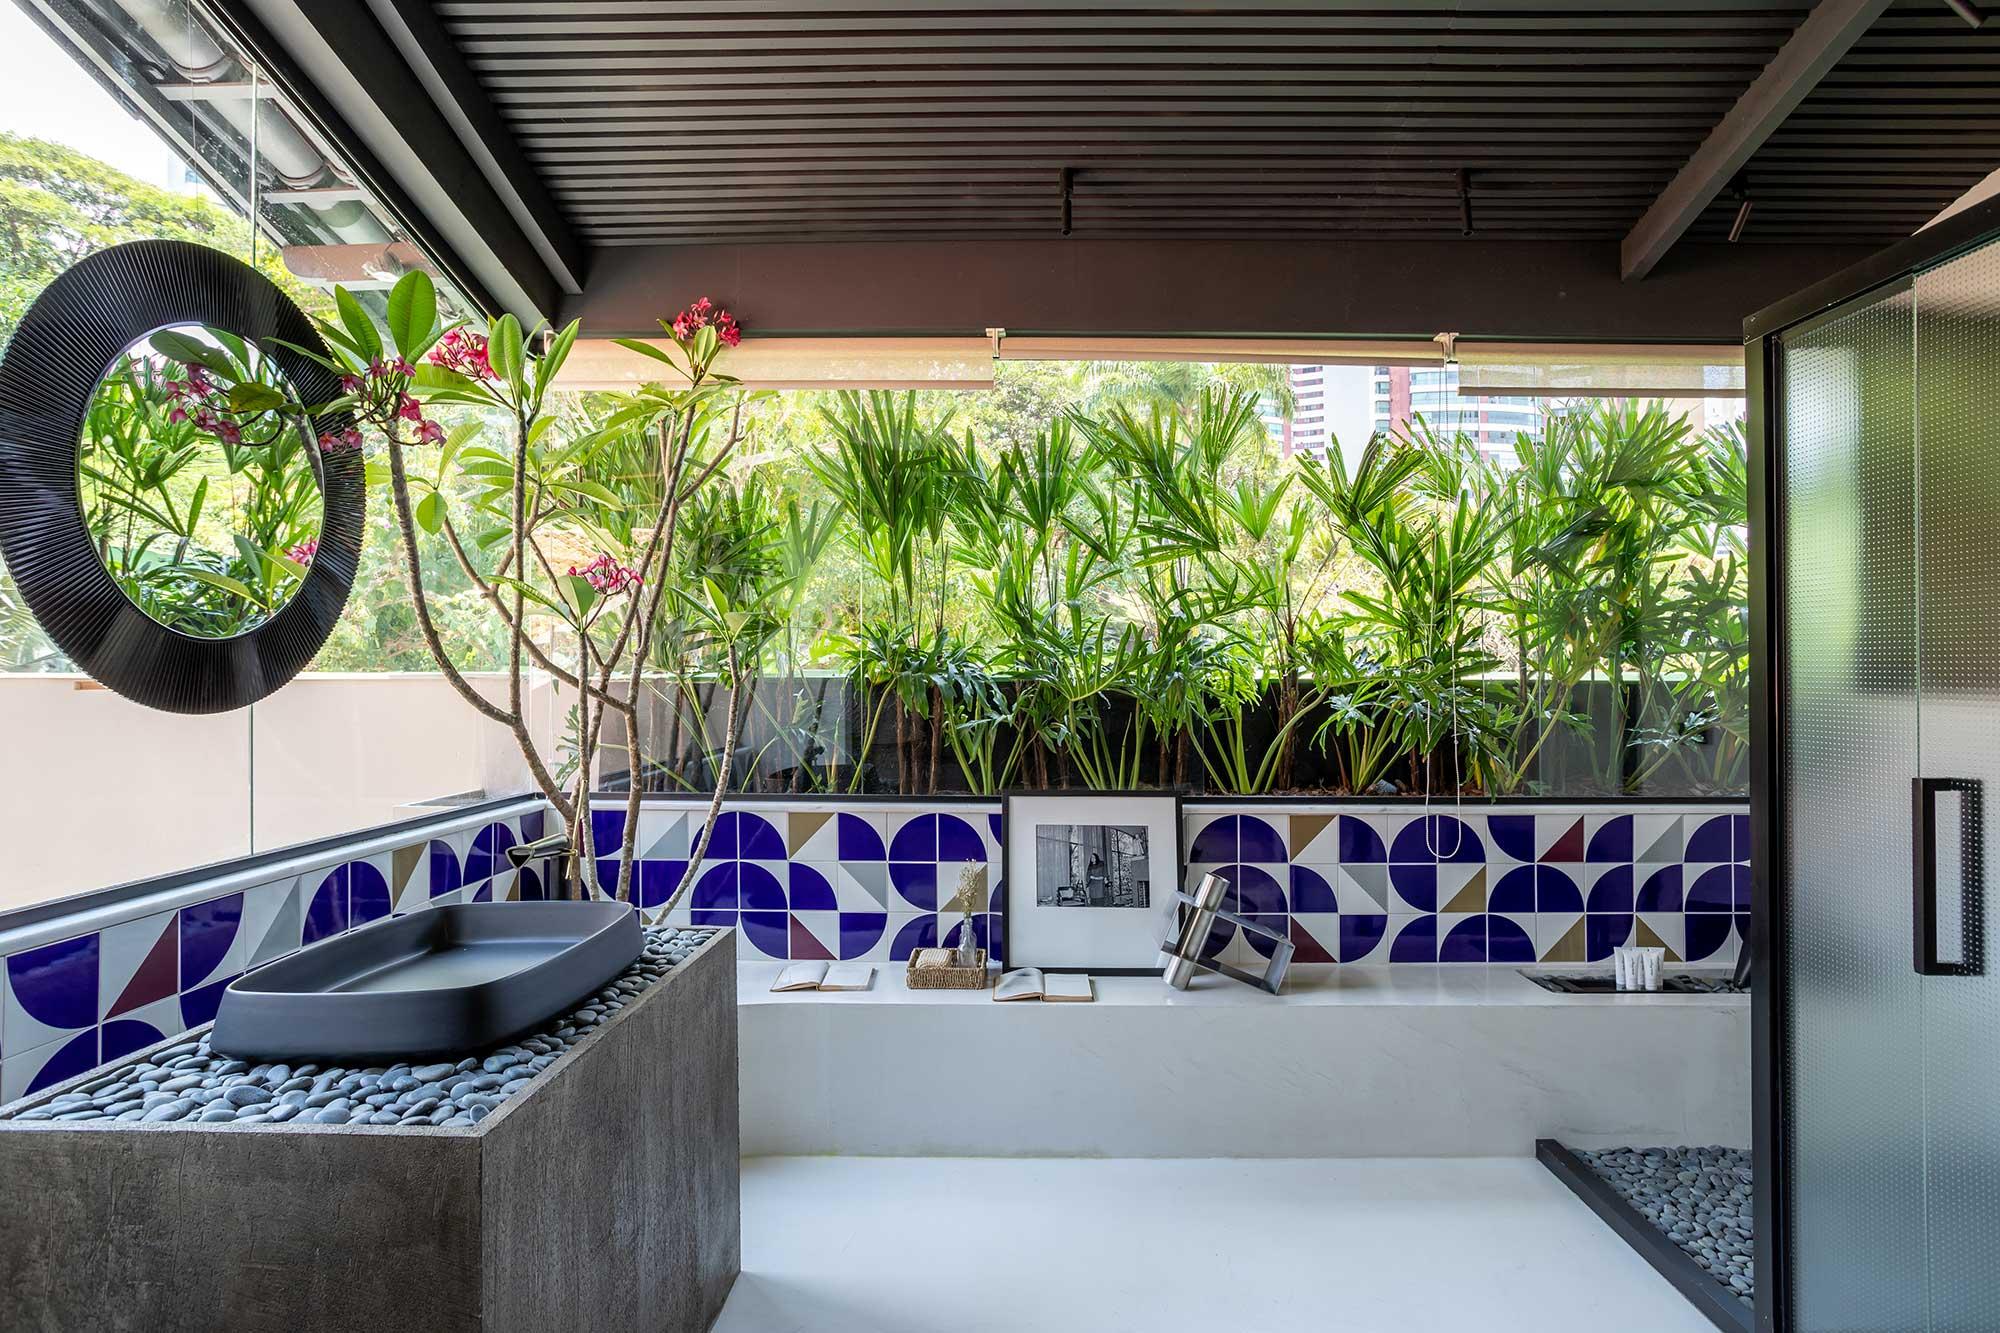 lais galvao casacor bahia 2019 casa 245 banheiro azulejo